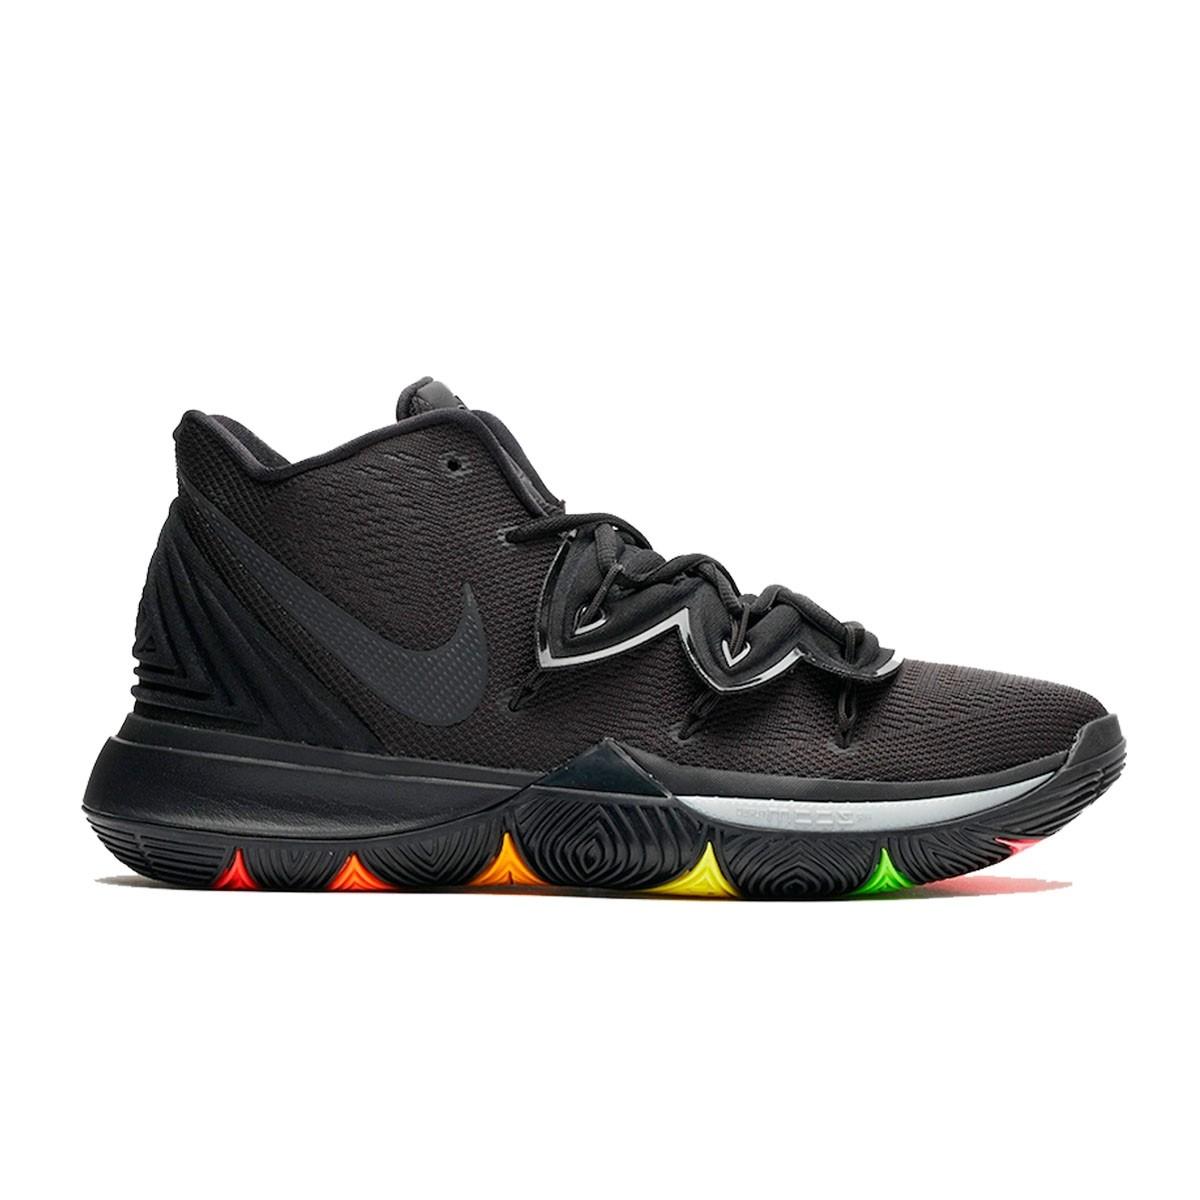 078c6bbb3c Nike Kyrie 5 'Black Rainbow'